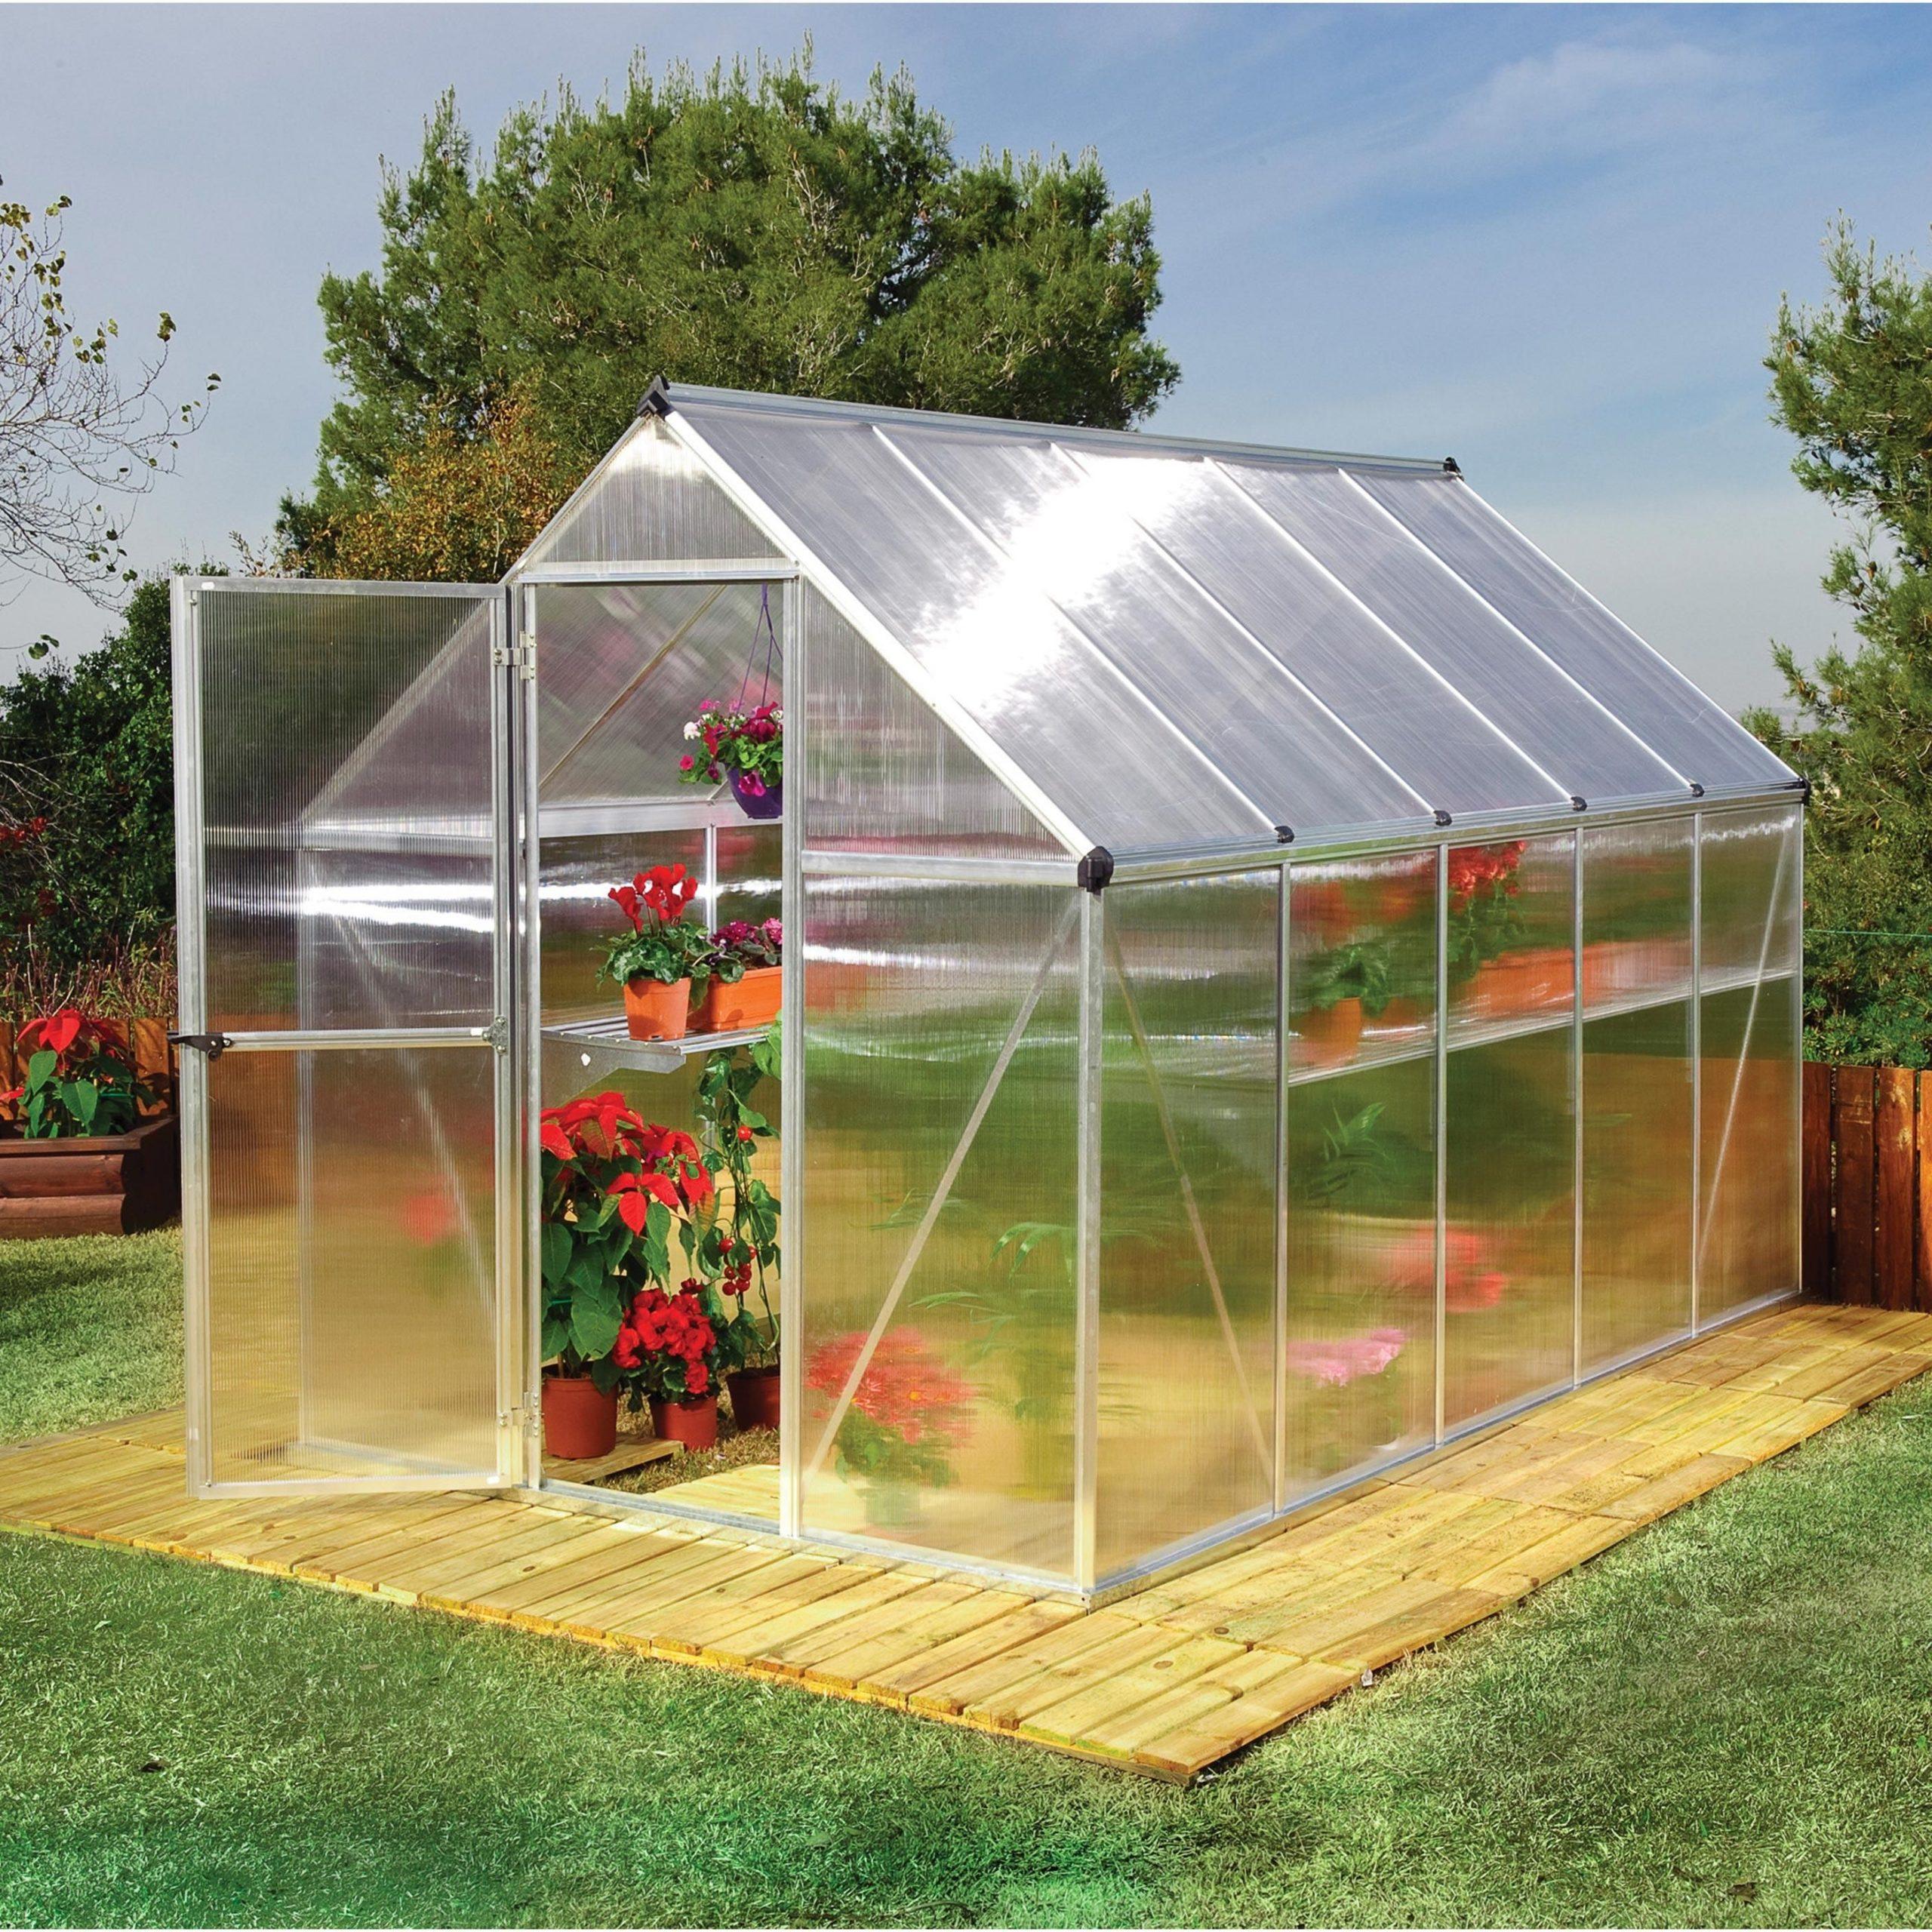 Serre De Jardin Mythos 5.6 M², Aluminium Et Polycarbonate ... pour Serre Jardin Polycarbonate